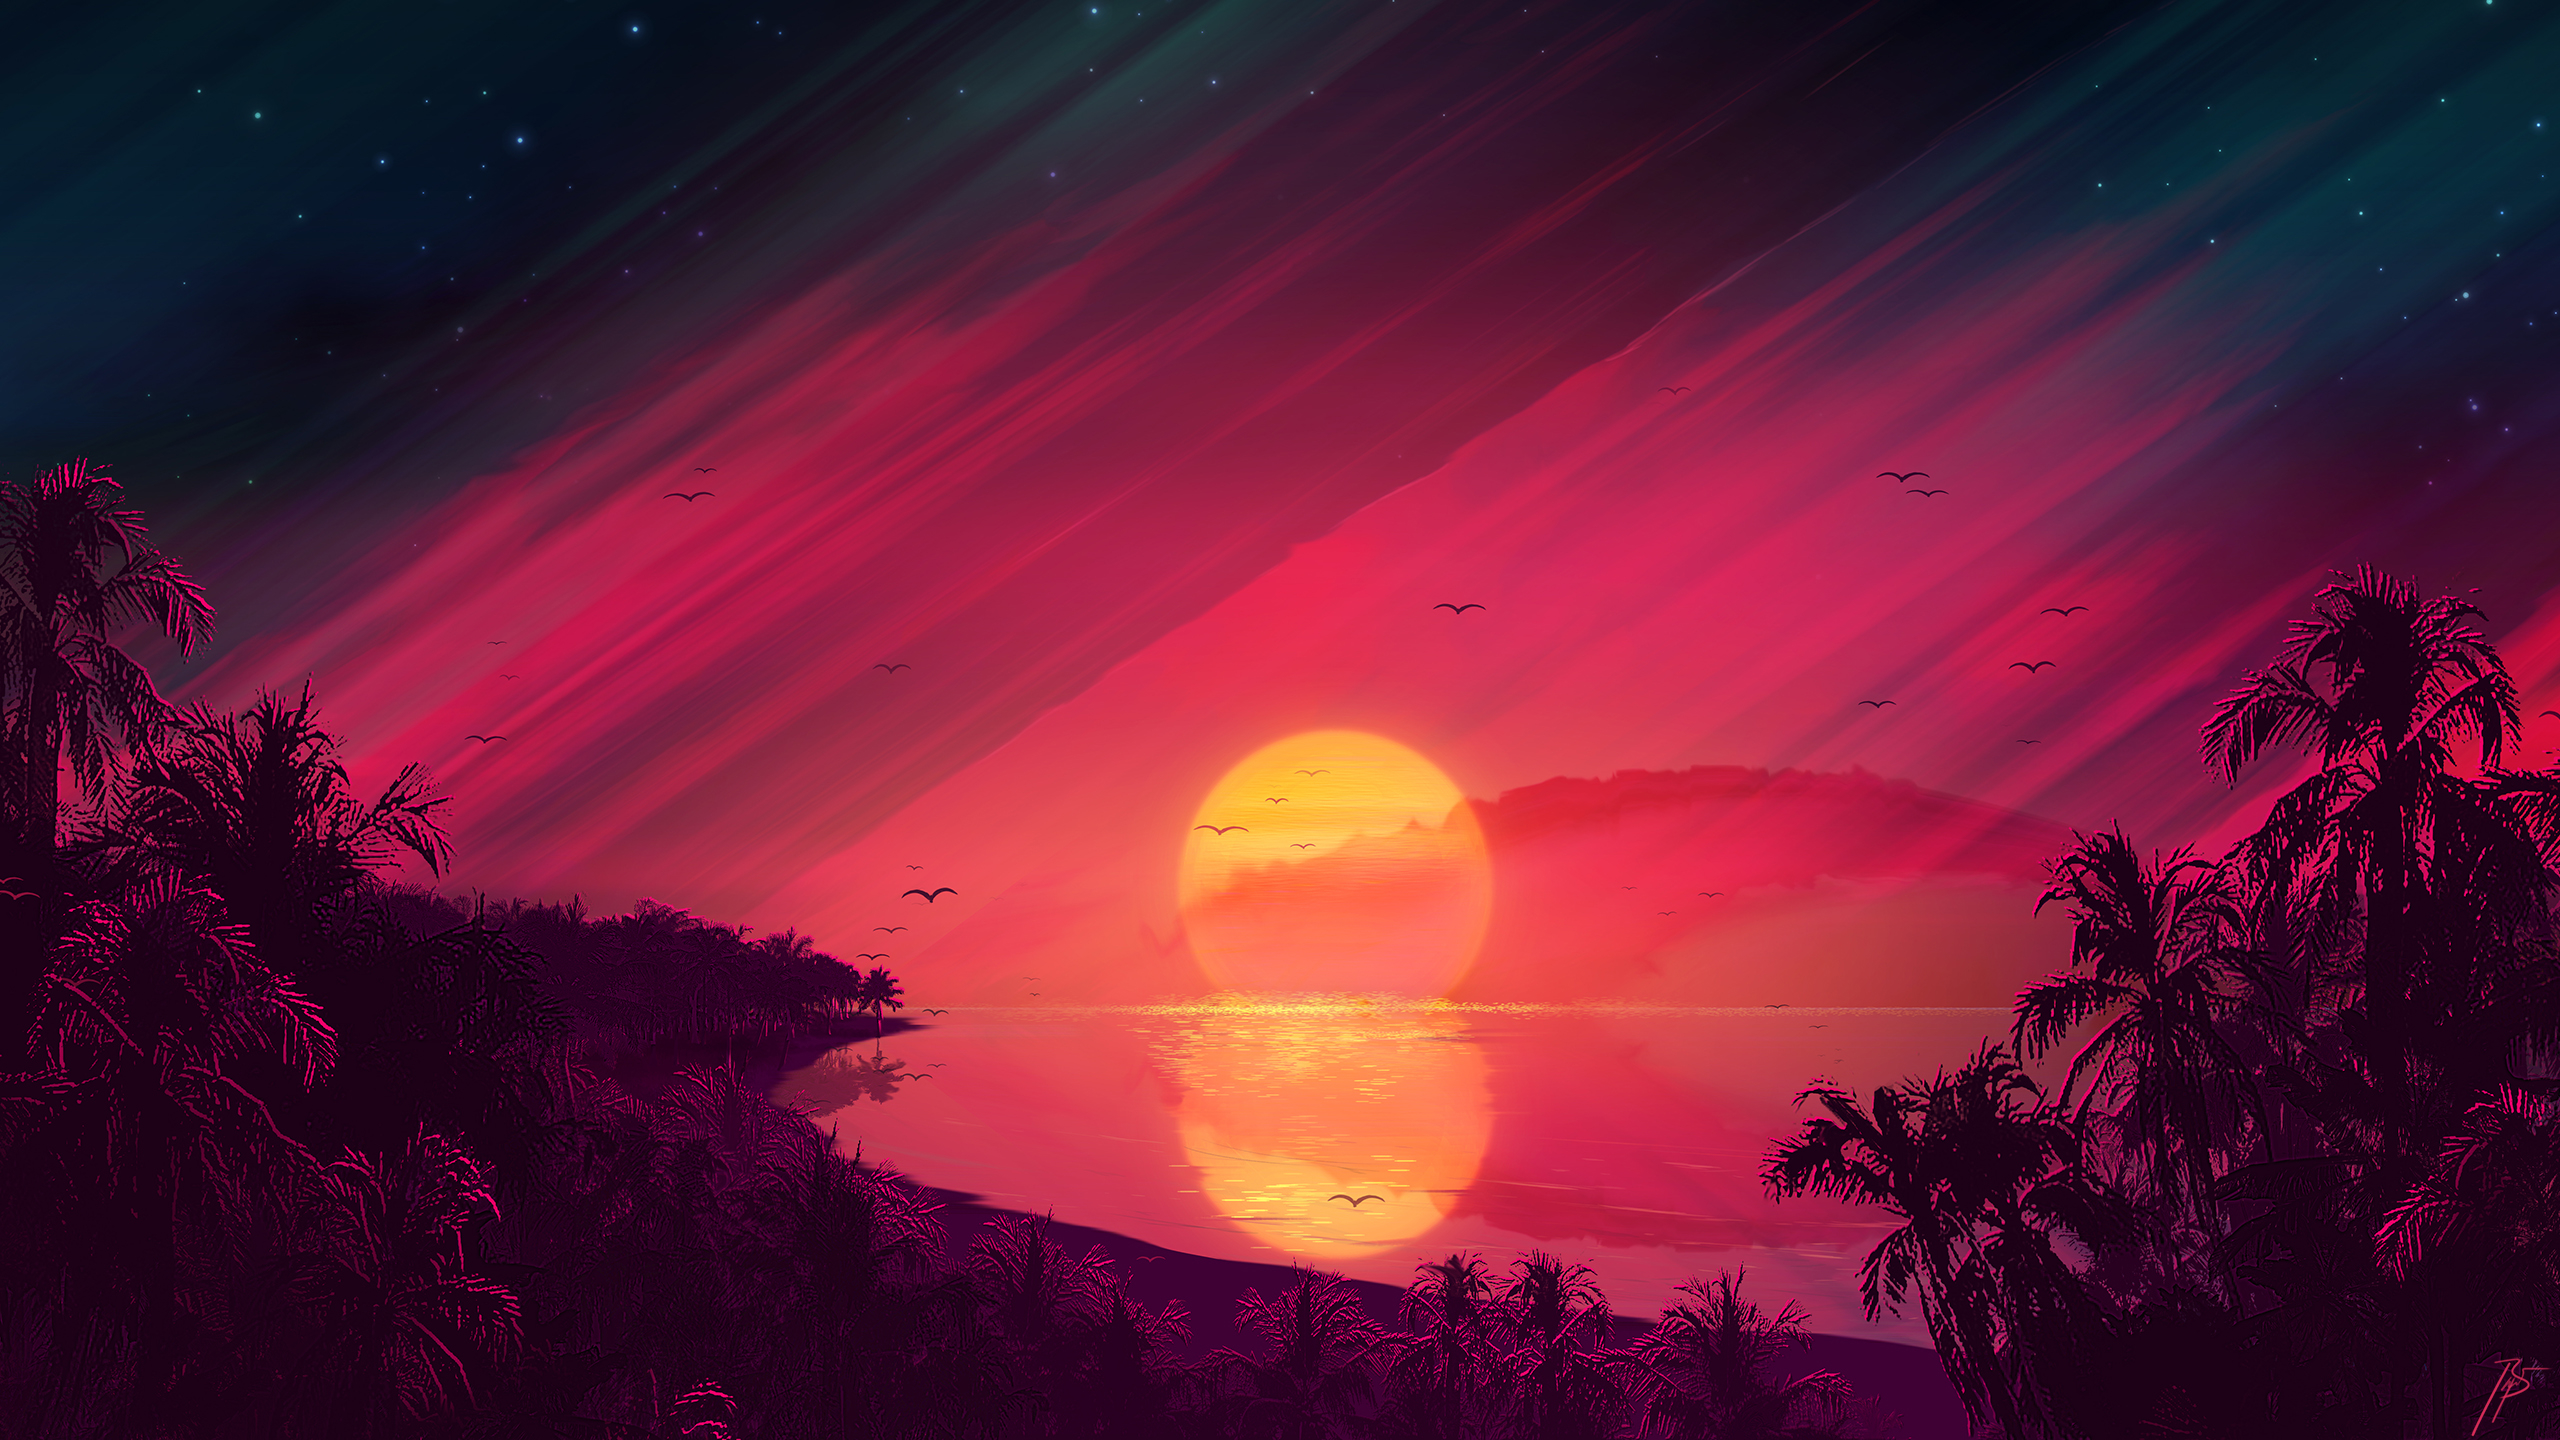 2560x1440 Retro Beach Art 1440p Resolution Wallpaper Hd